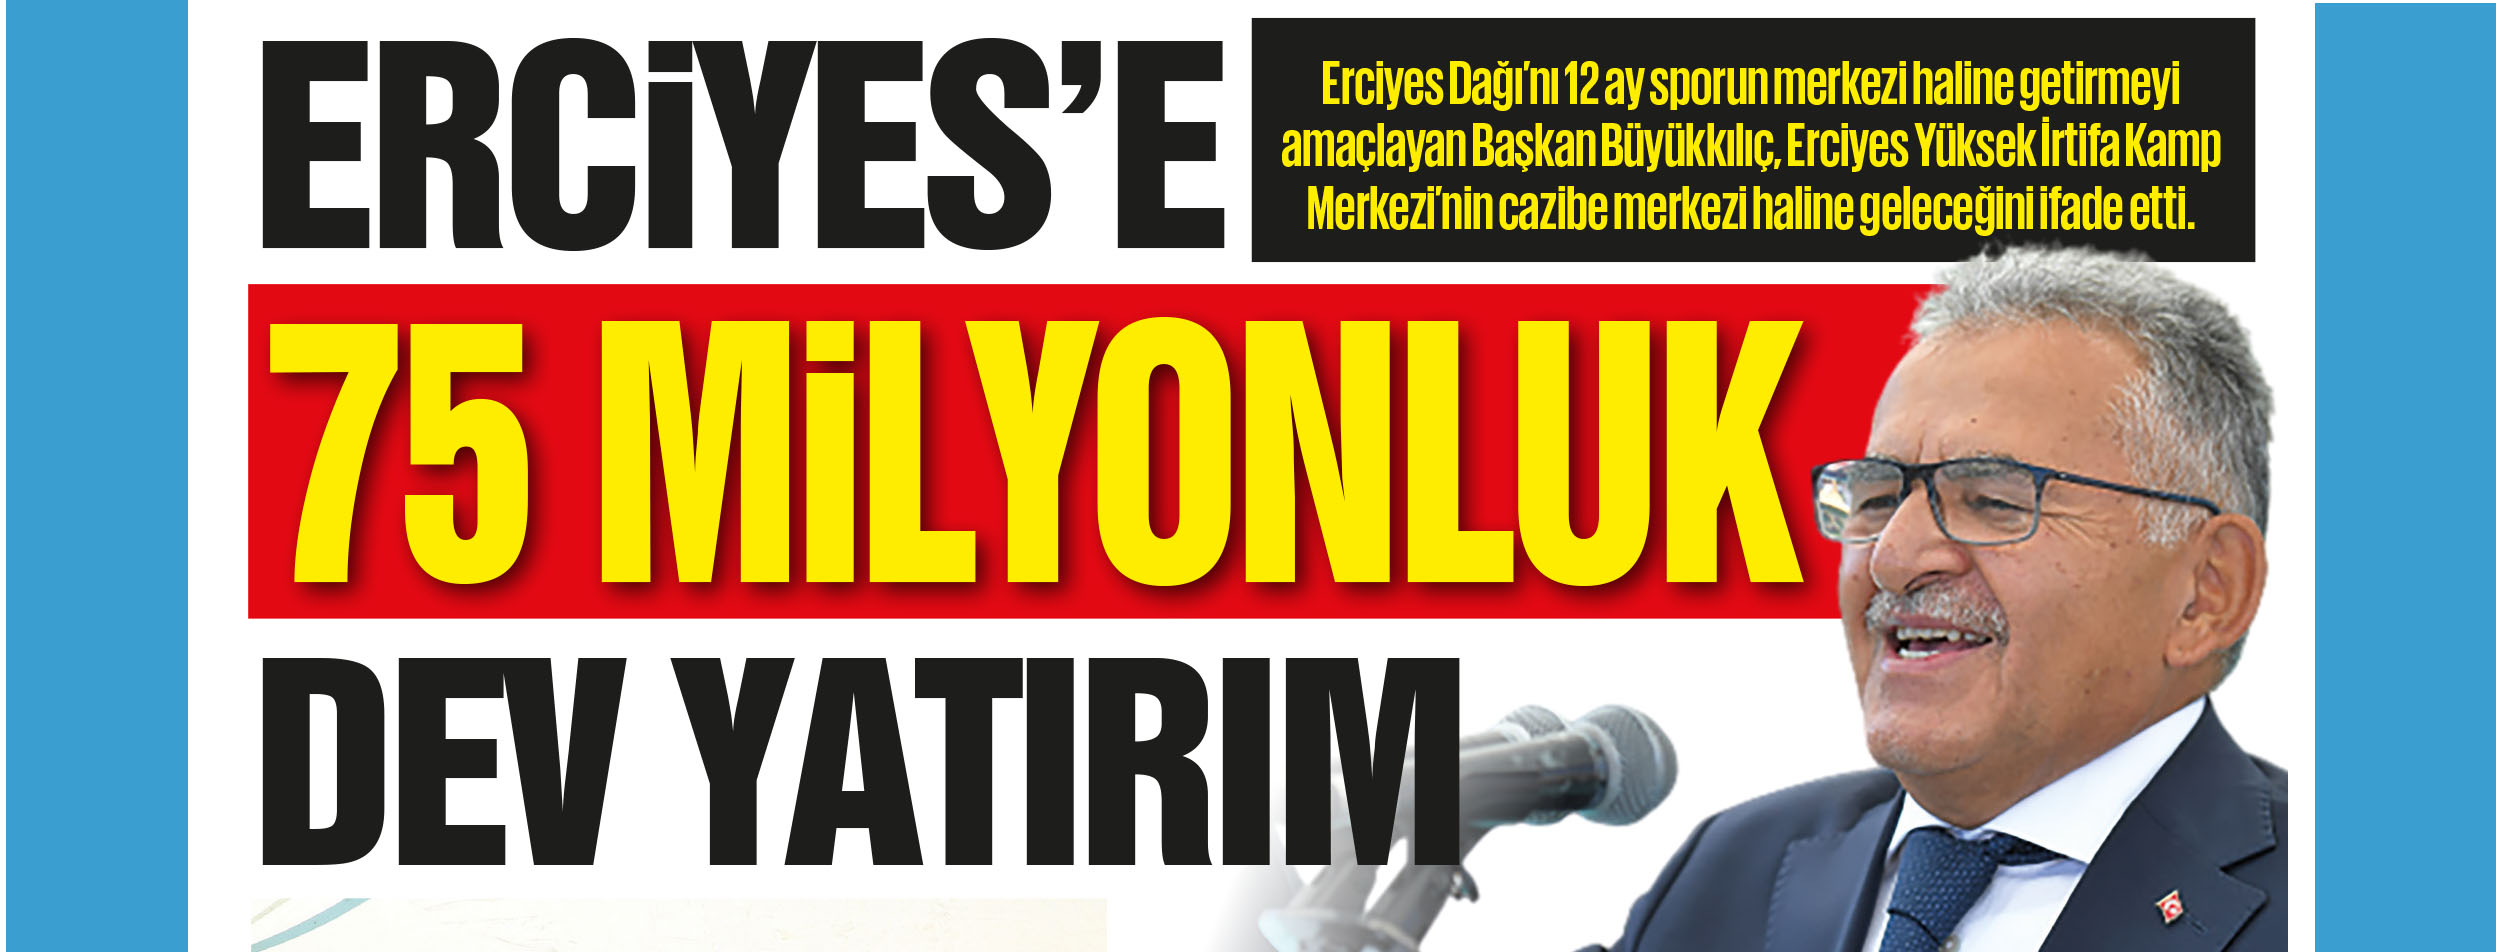 ERCİYES'E 75 MİLYONLUK DEV YATIRIM